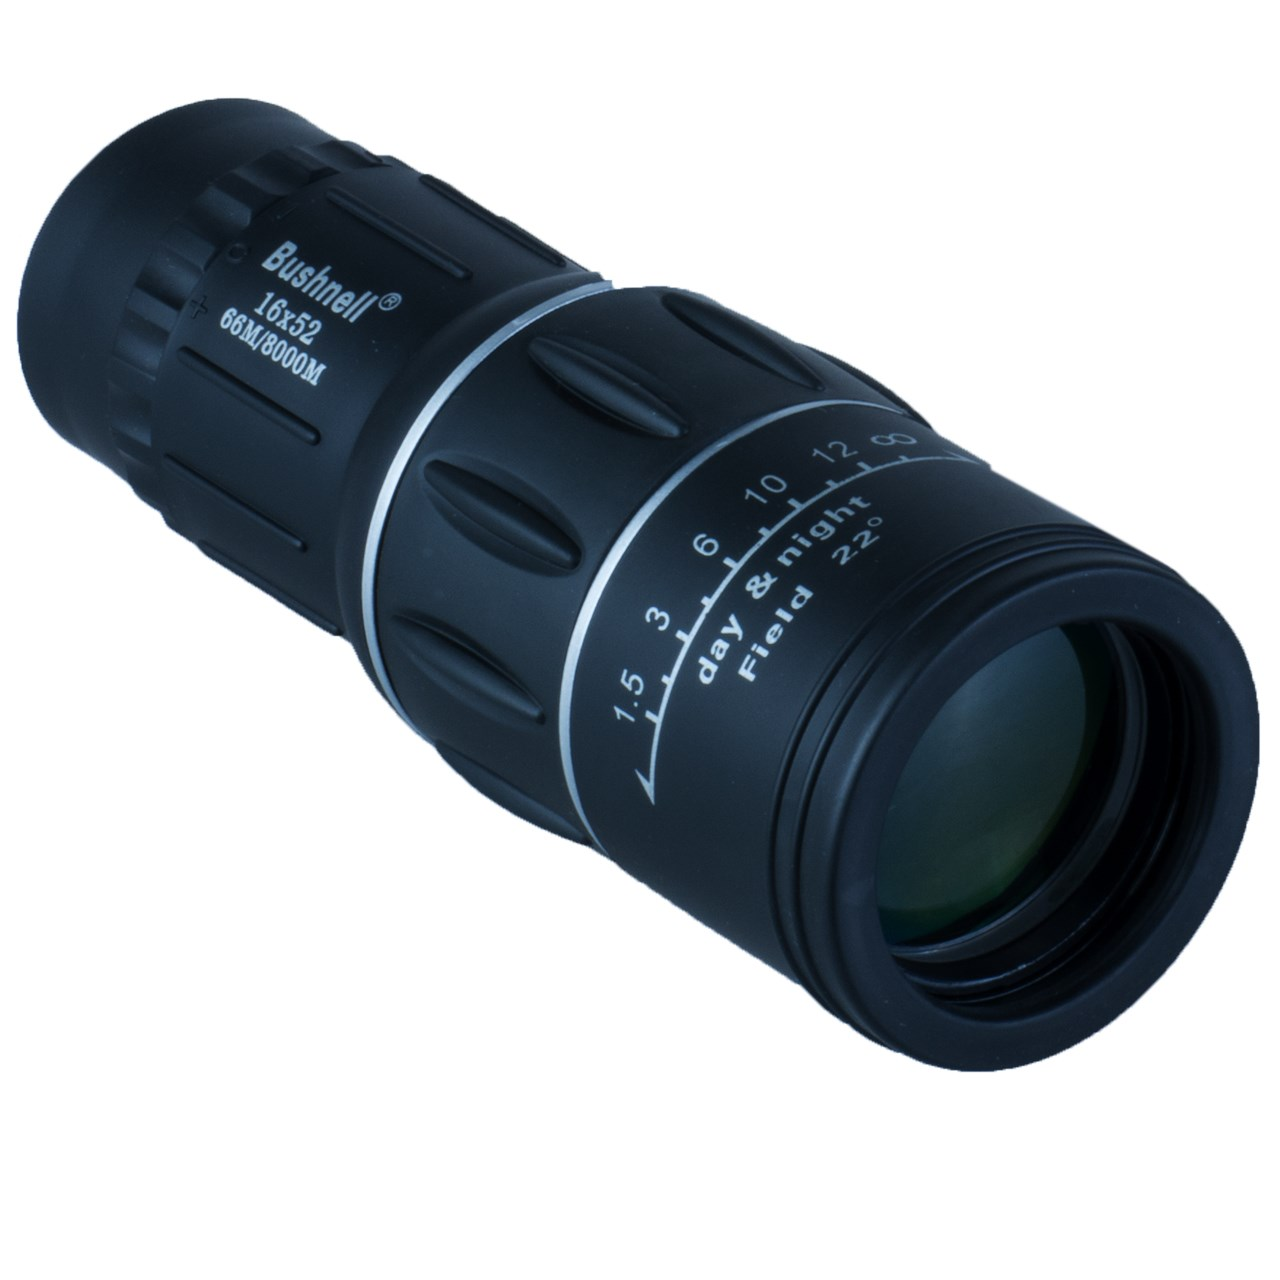 دوربین تک چشمی مدل 13-2401